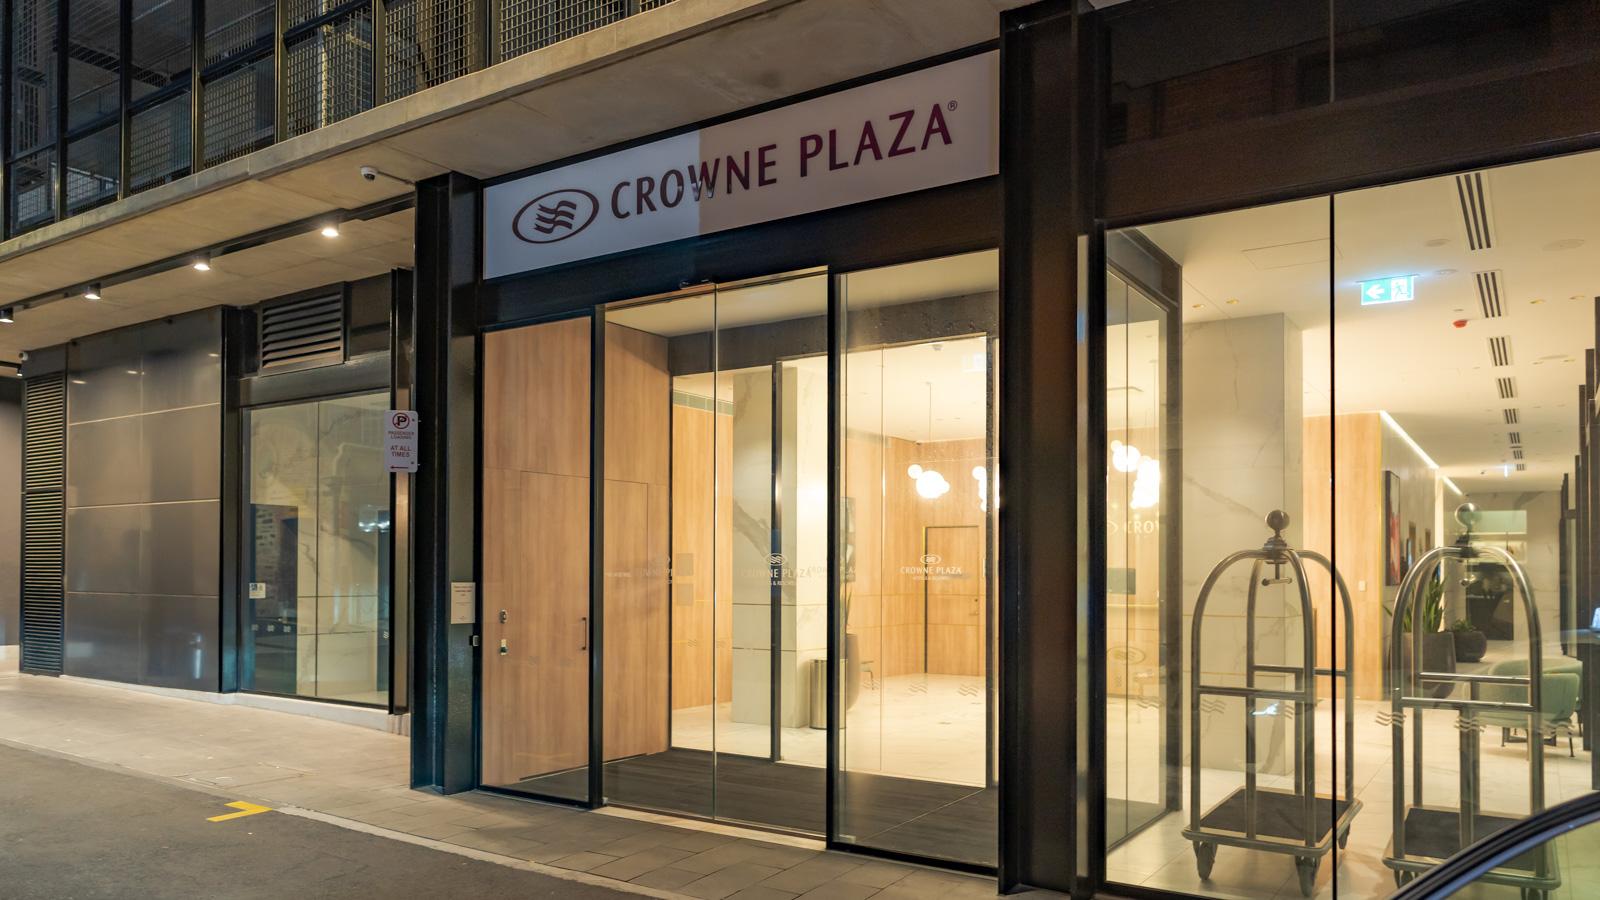 Crowne Plaza Adelaide side entrance